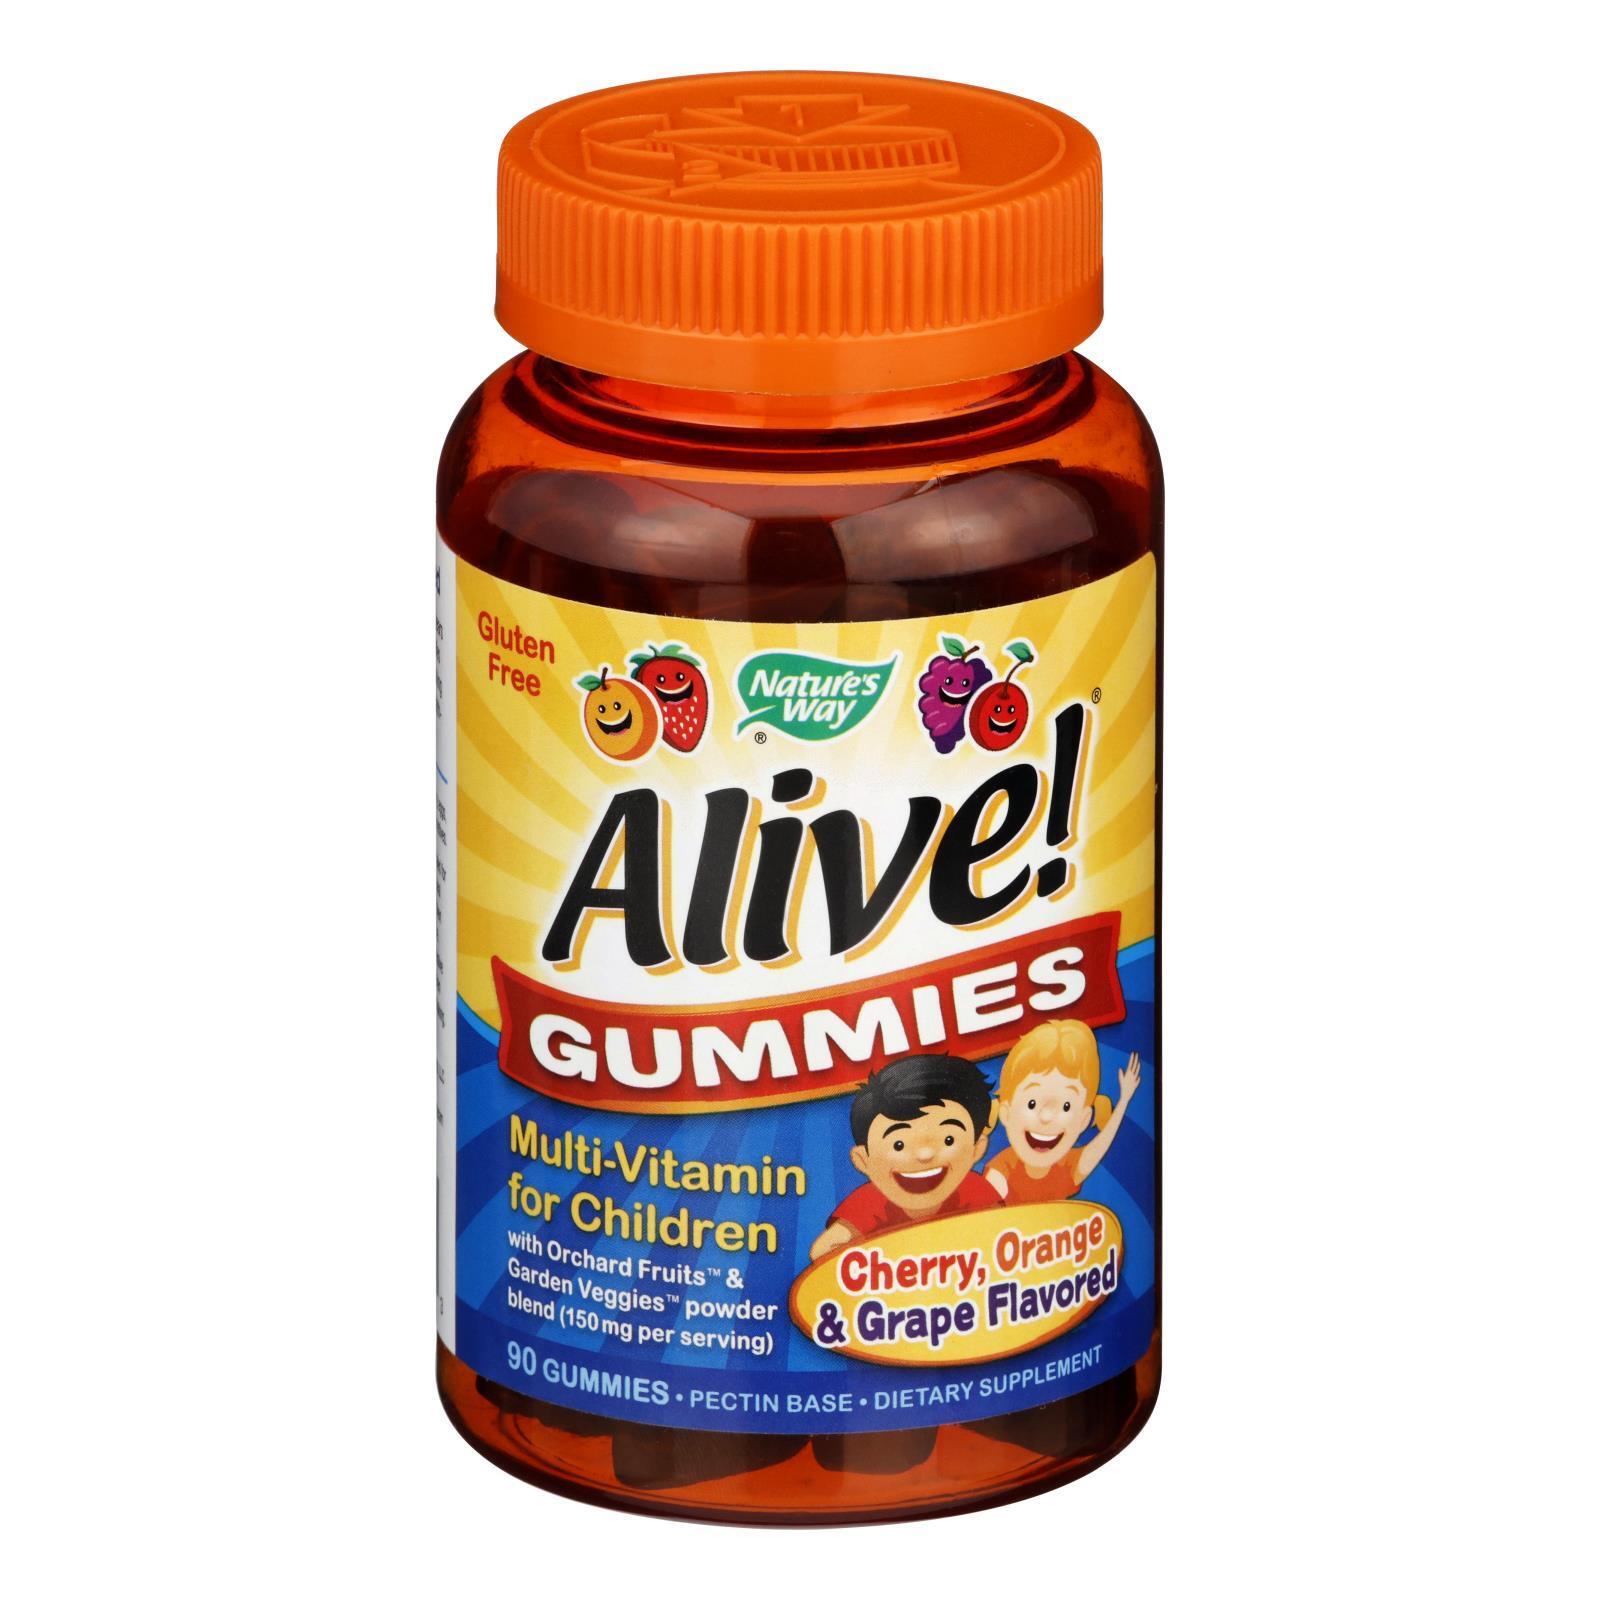 Nature's Way Alive Gummies Multi-Vitamin for Children Natural Cherry, Grape and Orange - 90 Gummies